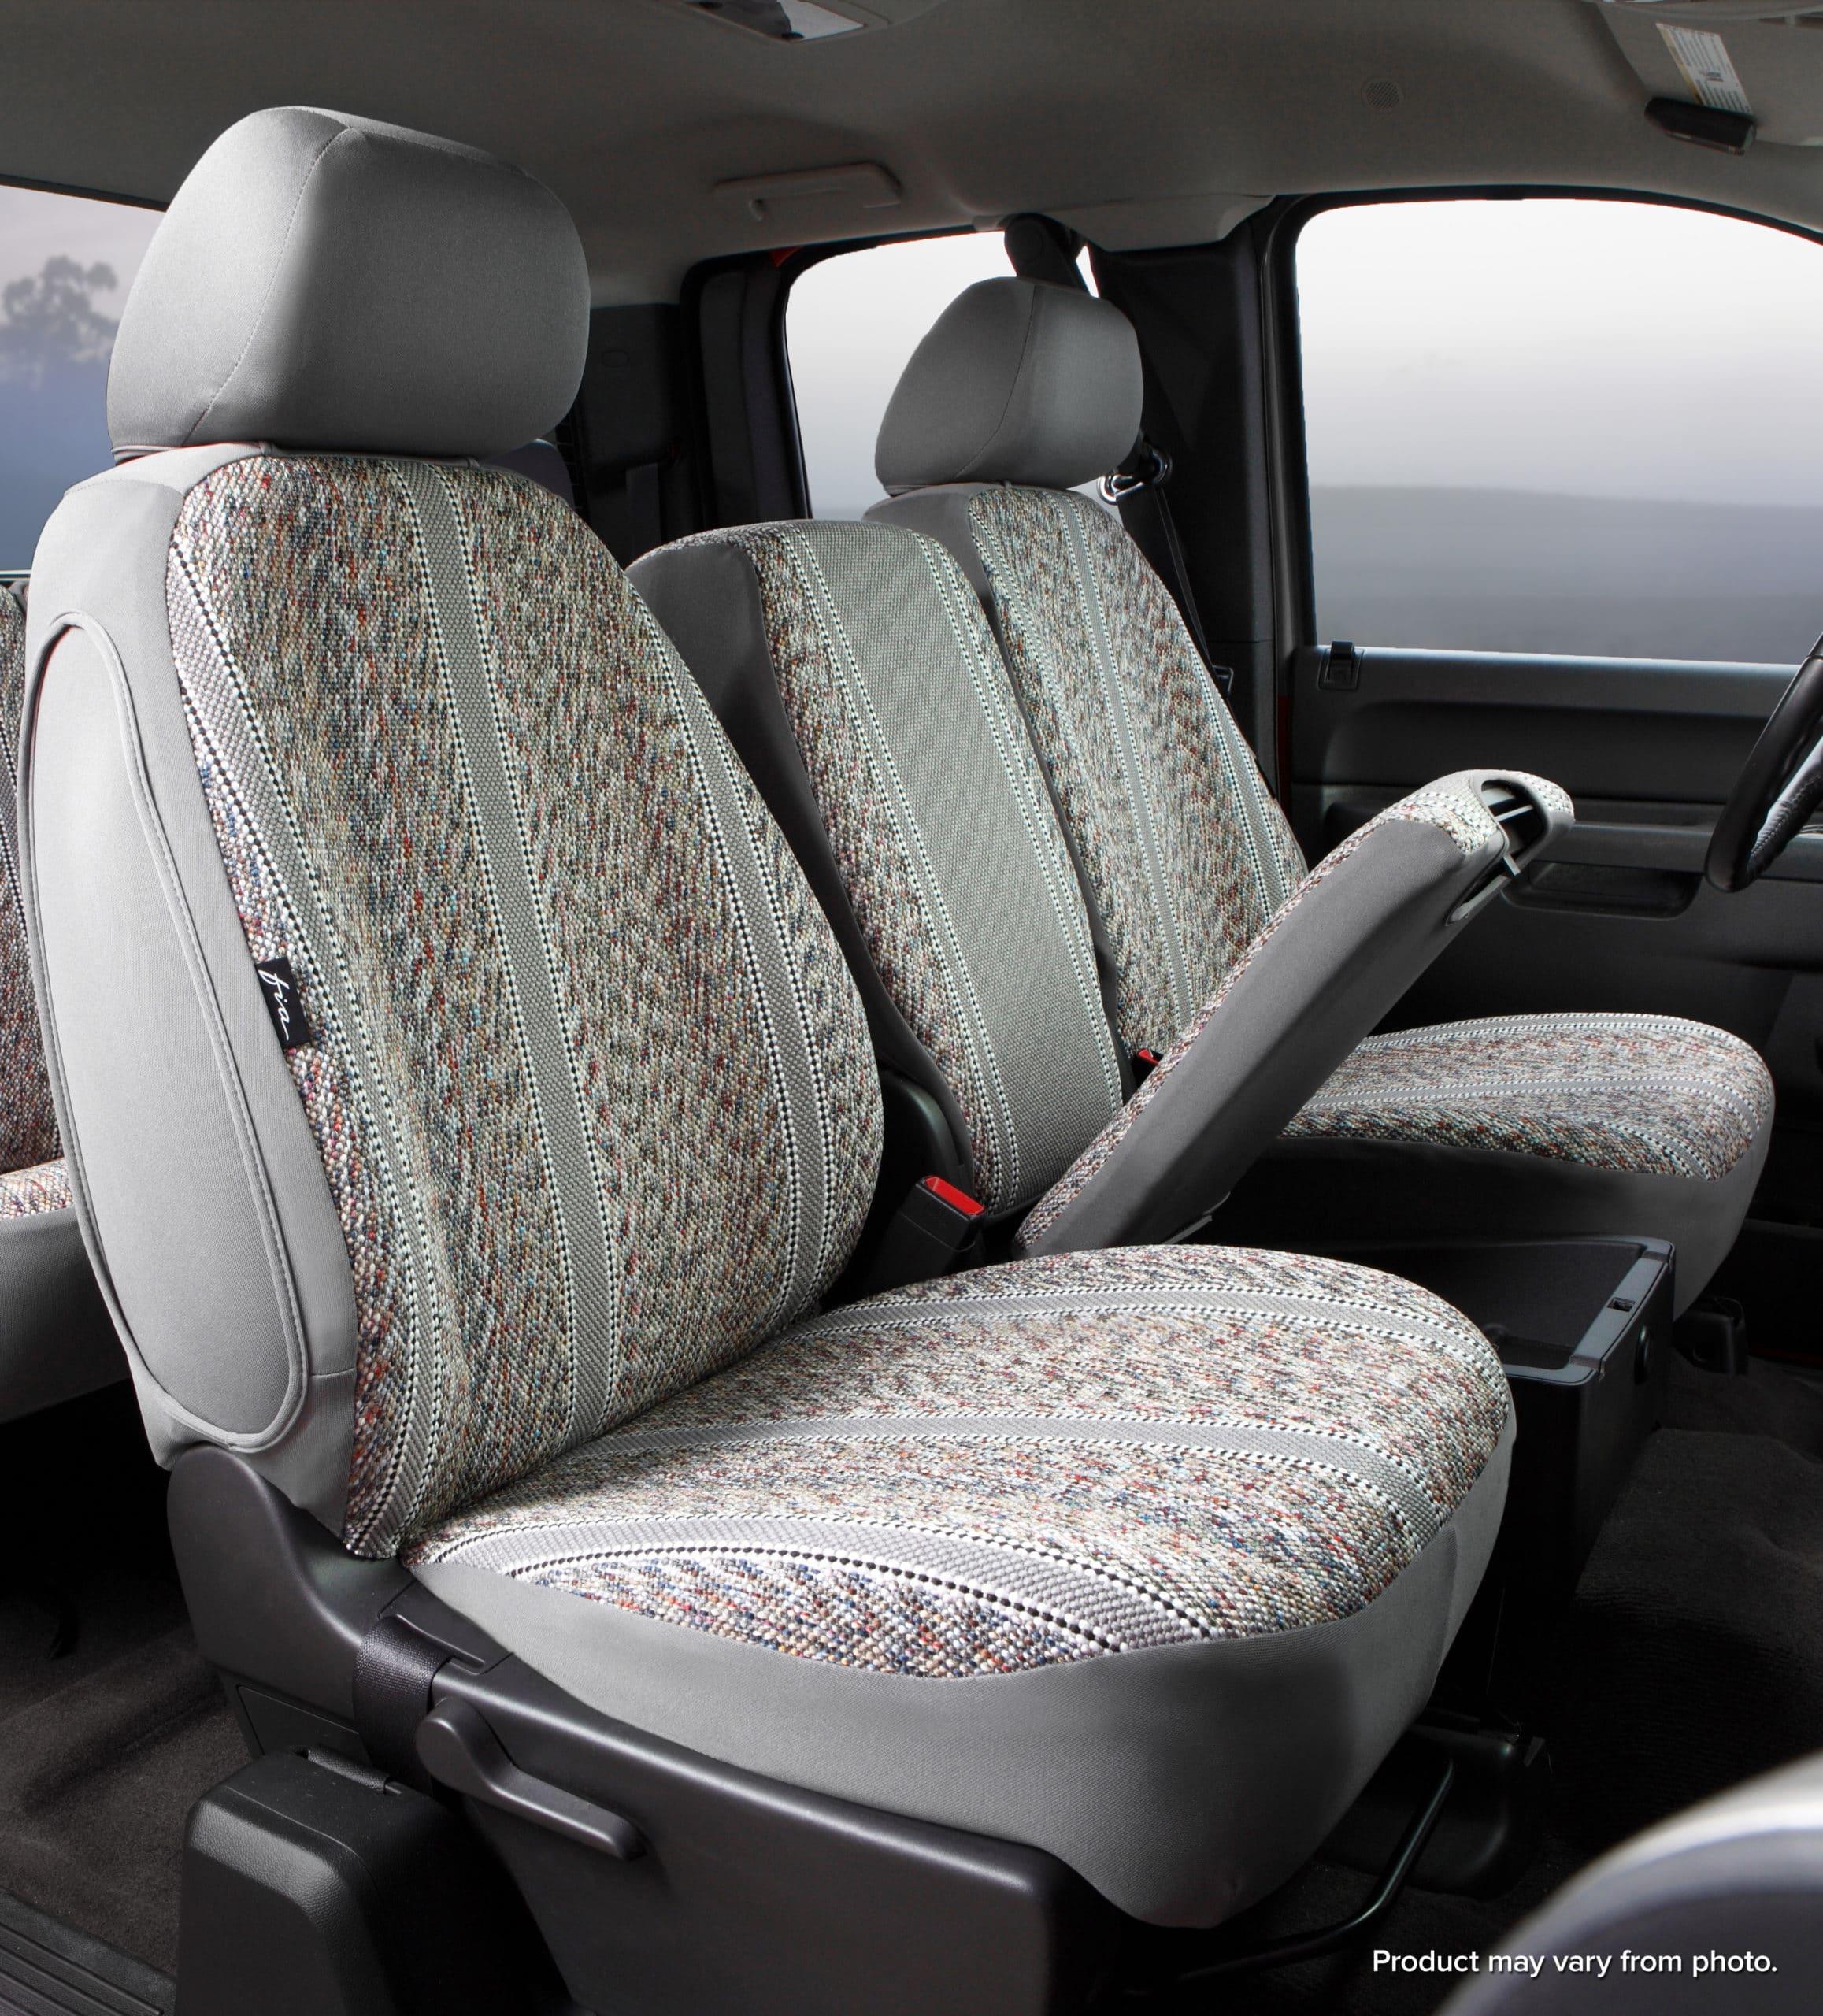 Fia Original Wrangler Seat Covers - Gray - Front Seats